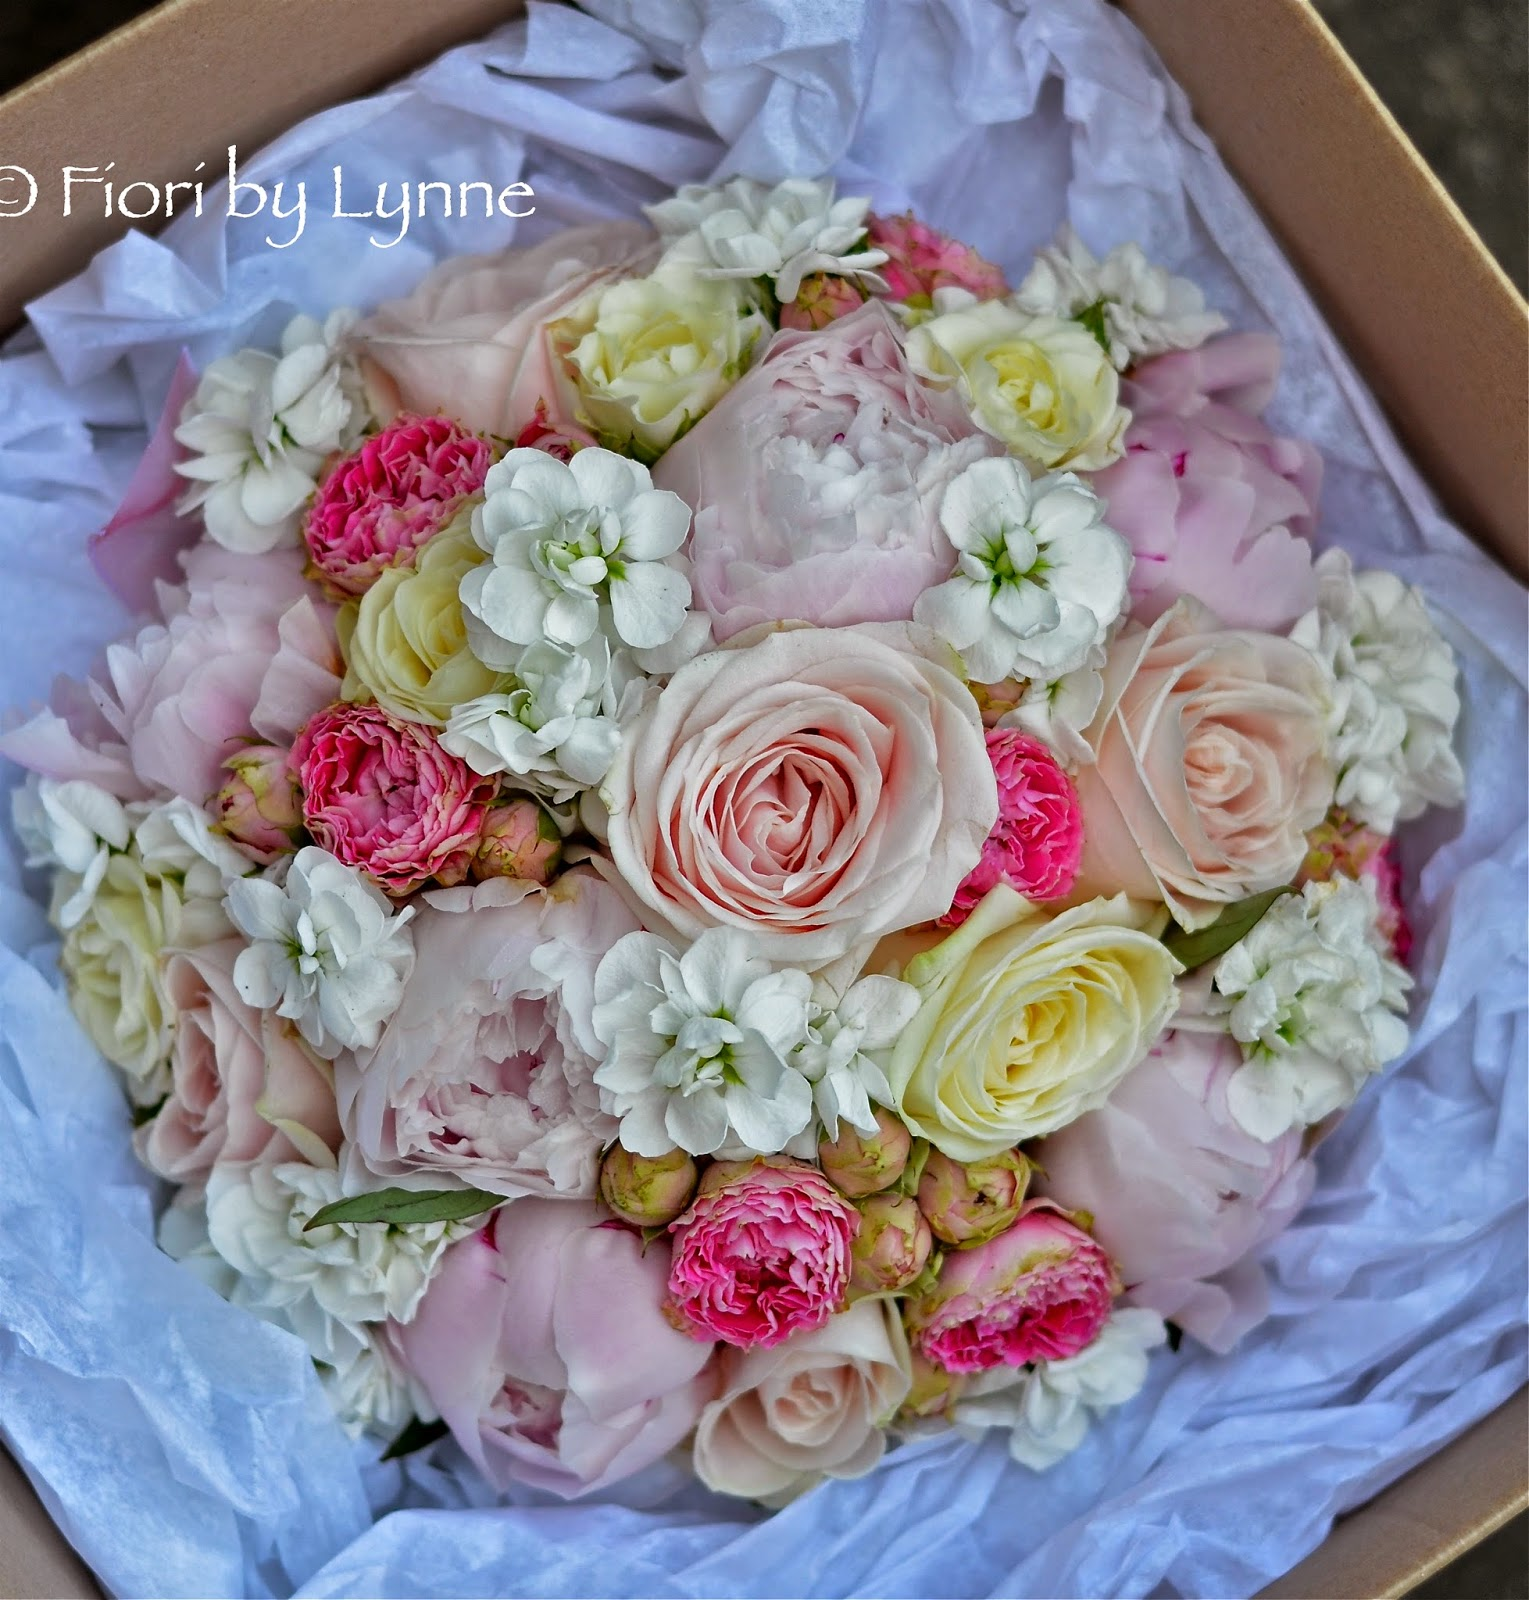 June Wedding Flowers: Wedding Flowers Blog: Gemma's June Wedding Flowers, The